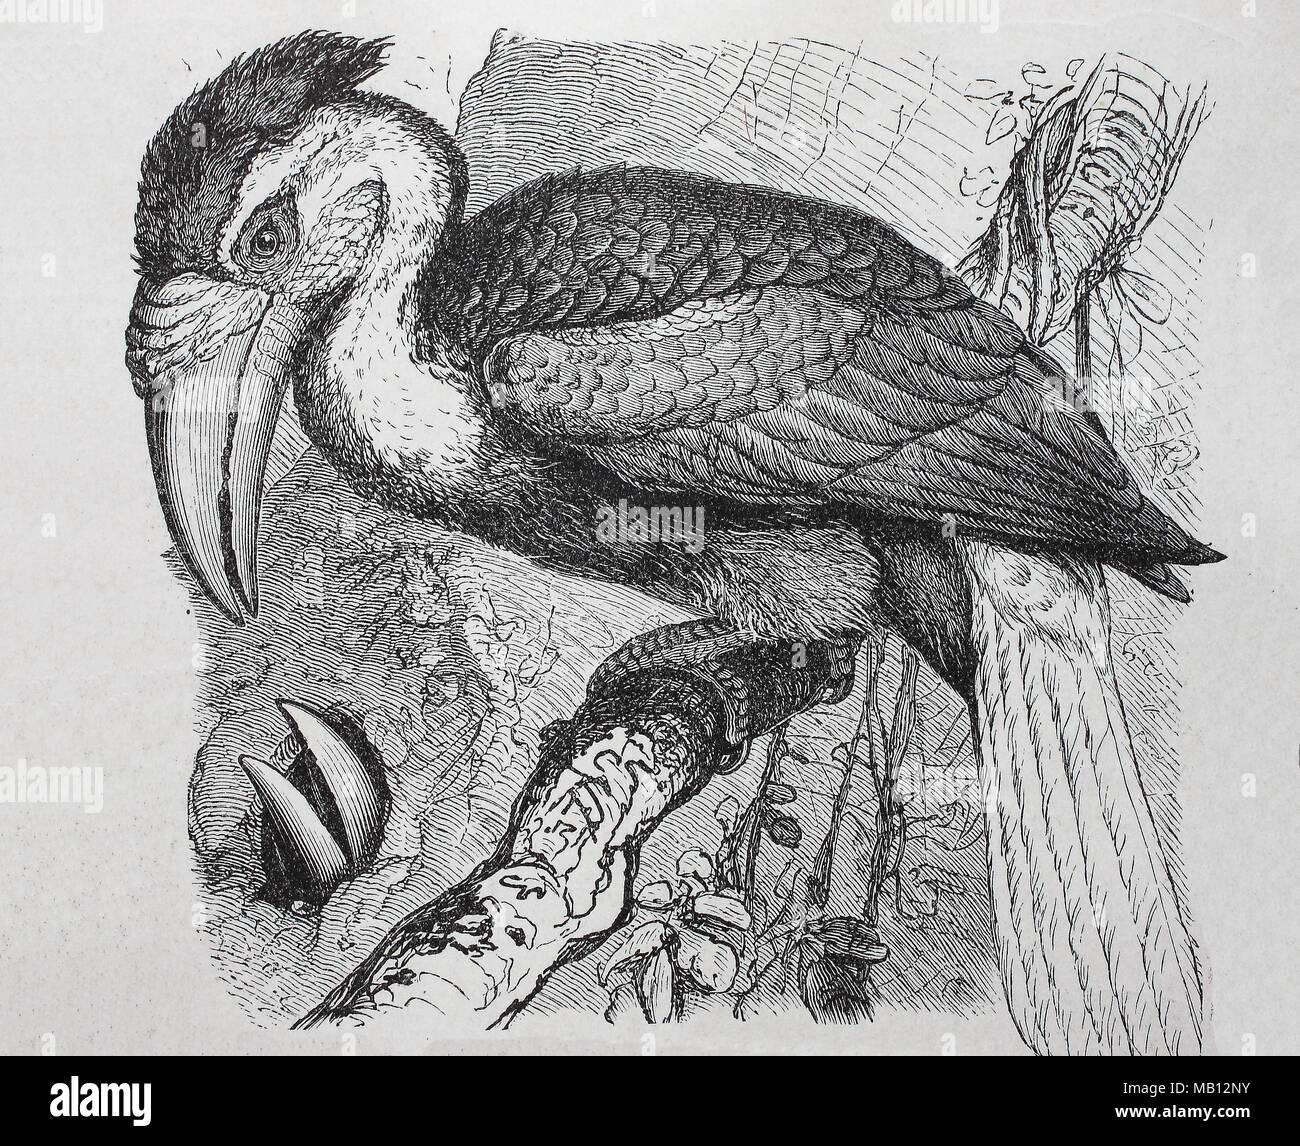 Faltenhornvogel, Jahrvogel, Doppelhornvogel, Buceros bicornis, Great Hornbill, digital verbesserte Reproduktion einer Vorlage drucken aus dem Jahr 1895 Stockbild